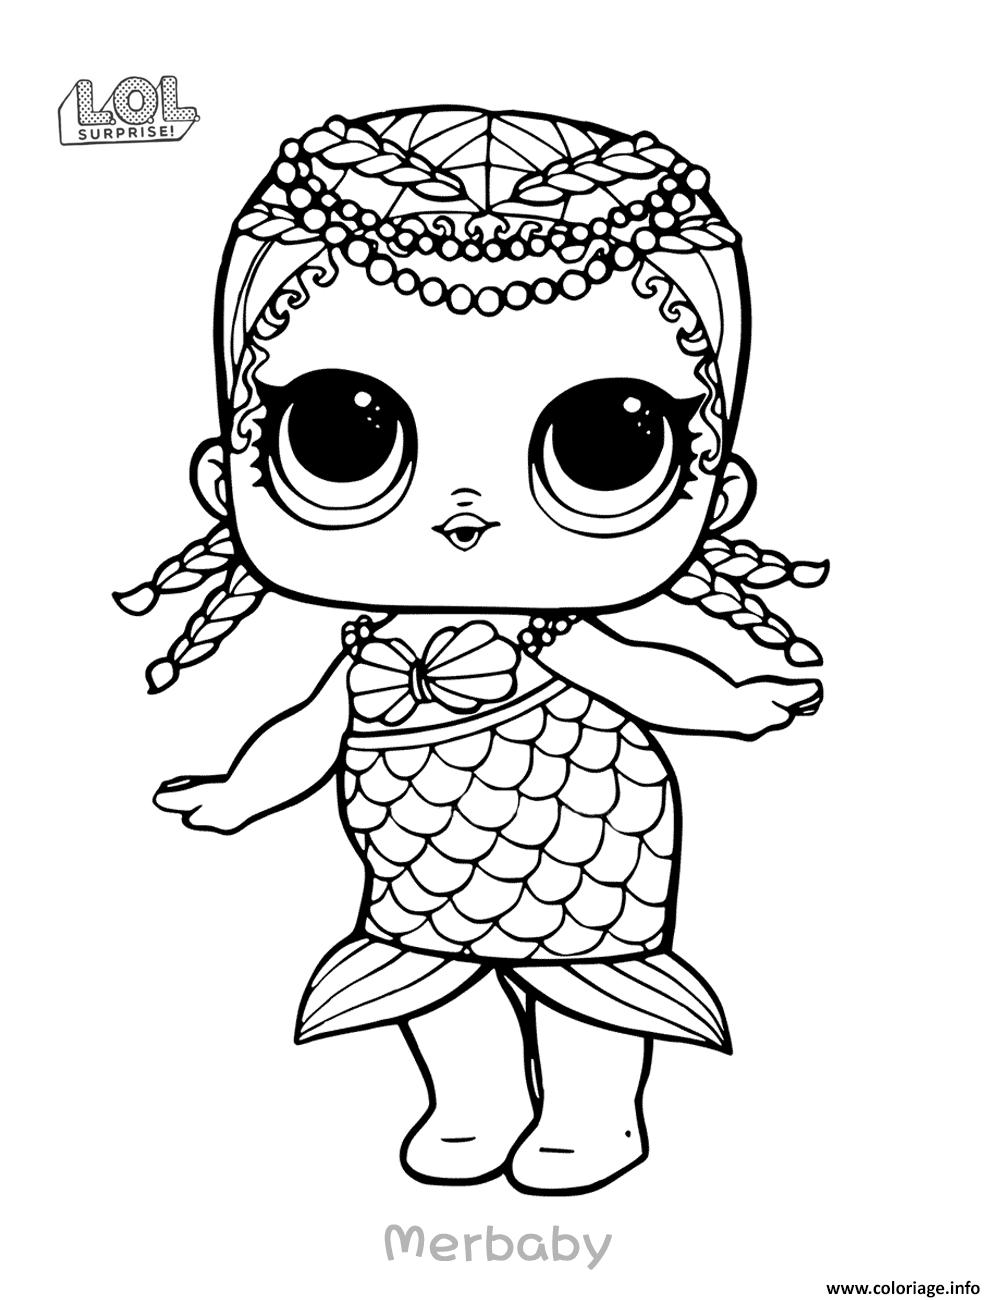 Coloriage Mermaid Lol Surprise Doll Merbaby Jecolorie Com